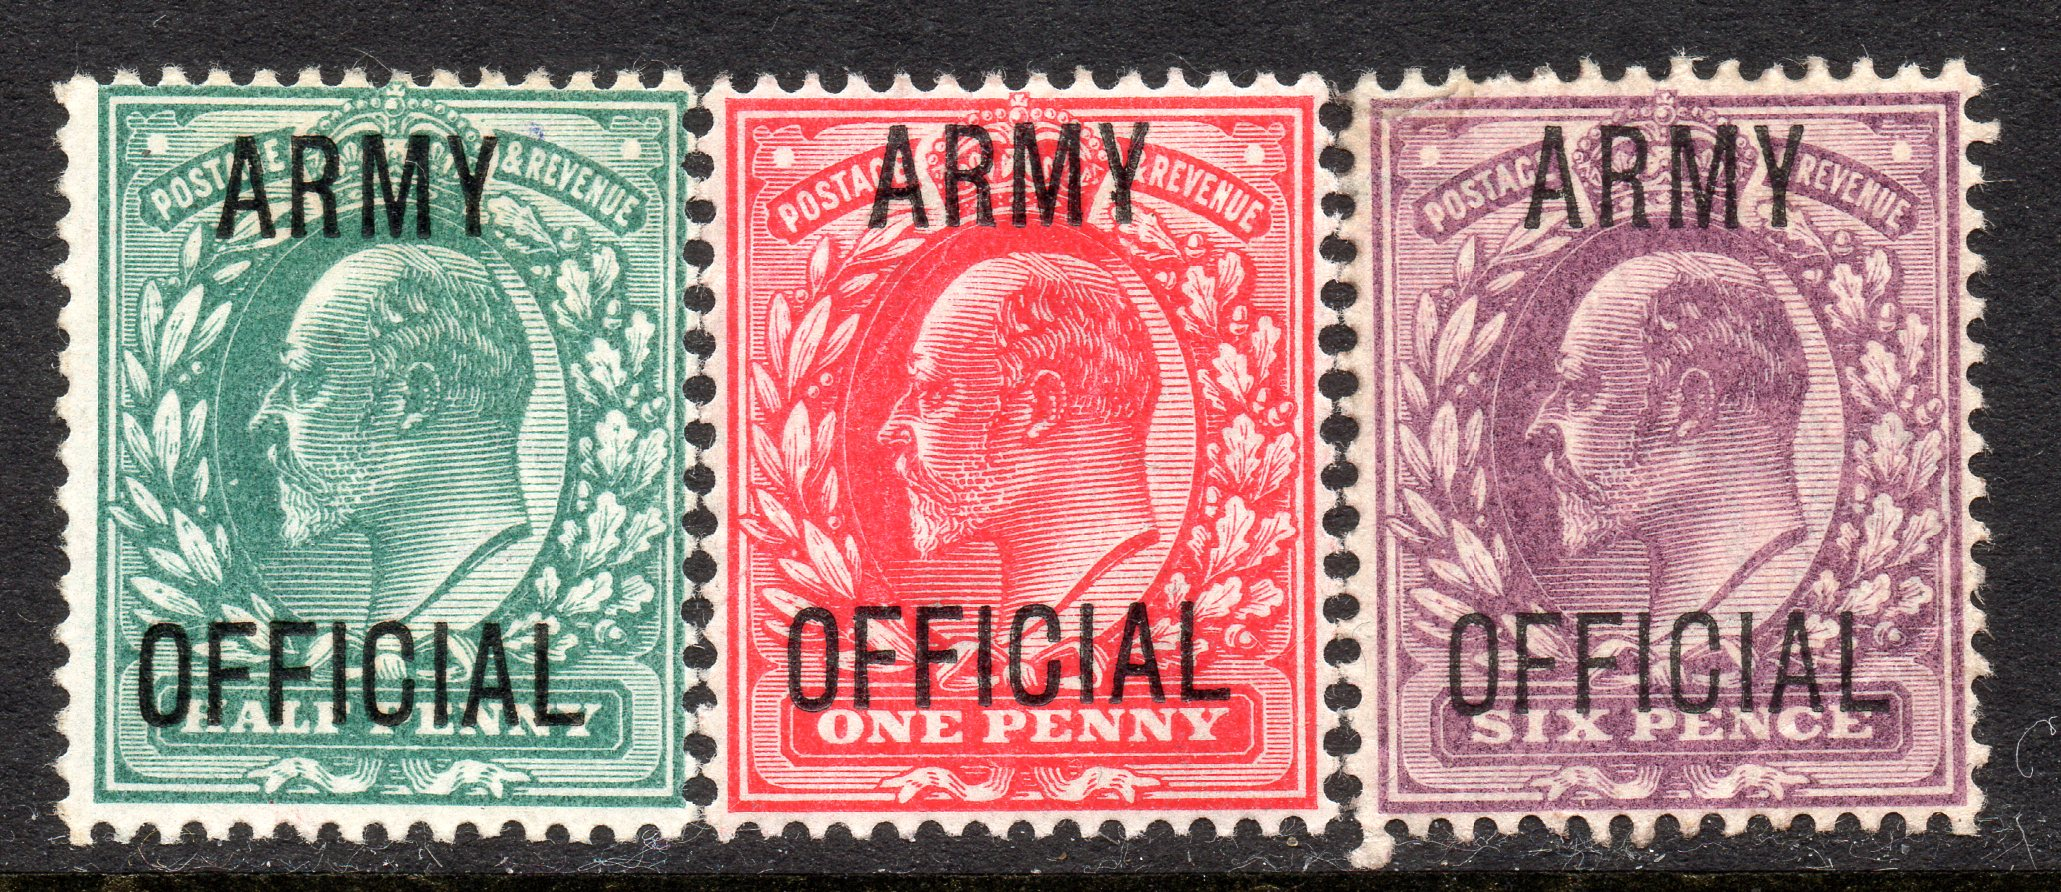 1902 Edward Mint ARMY OFFICIAL Set